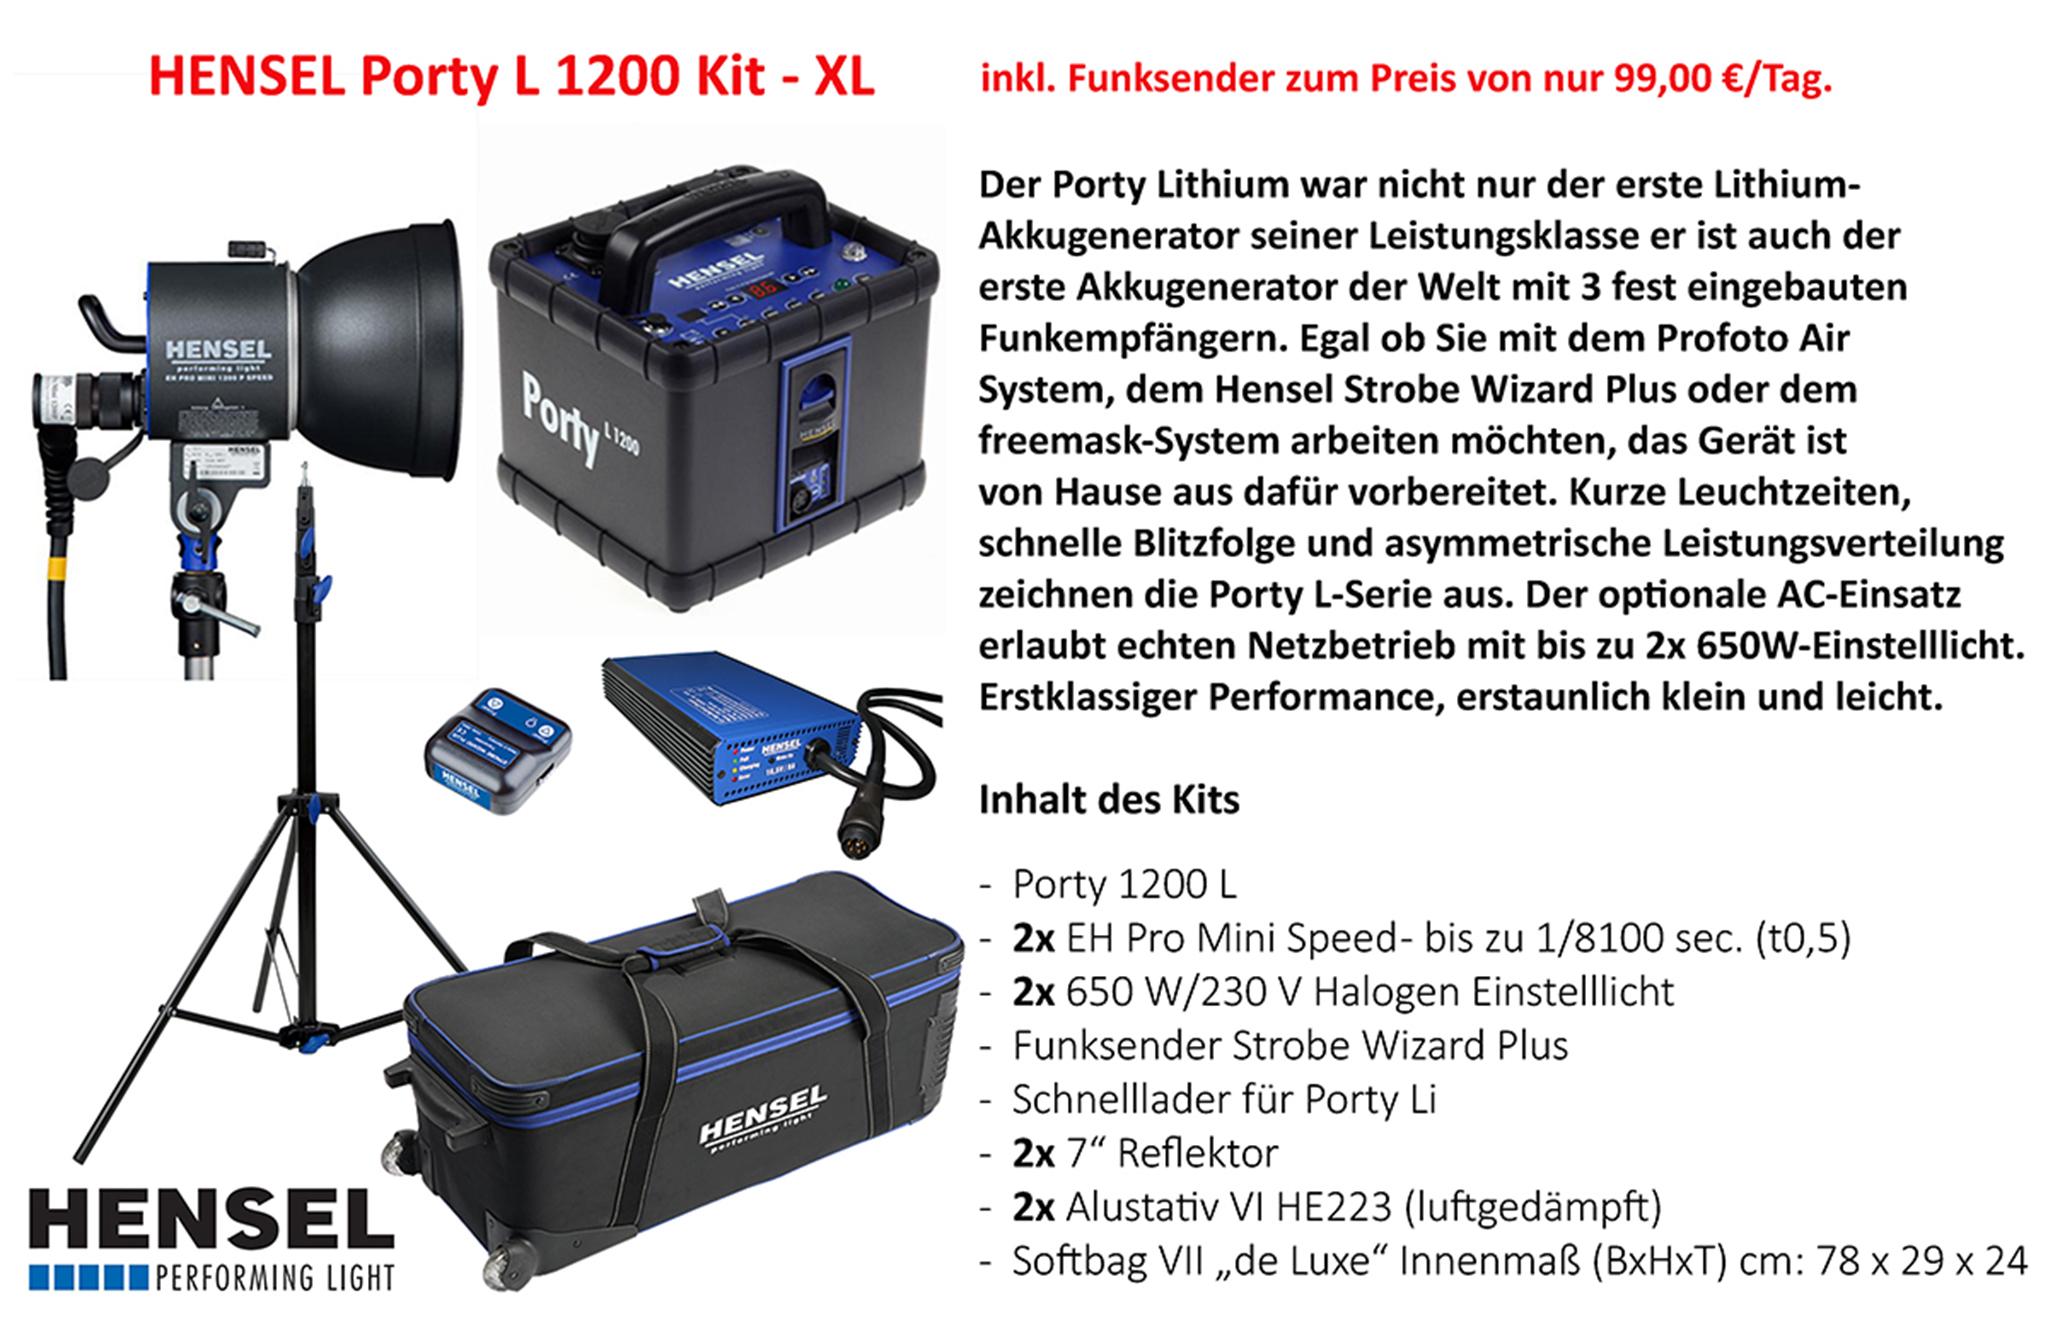 Hensel Porty L 1200 Kit - XL